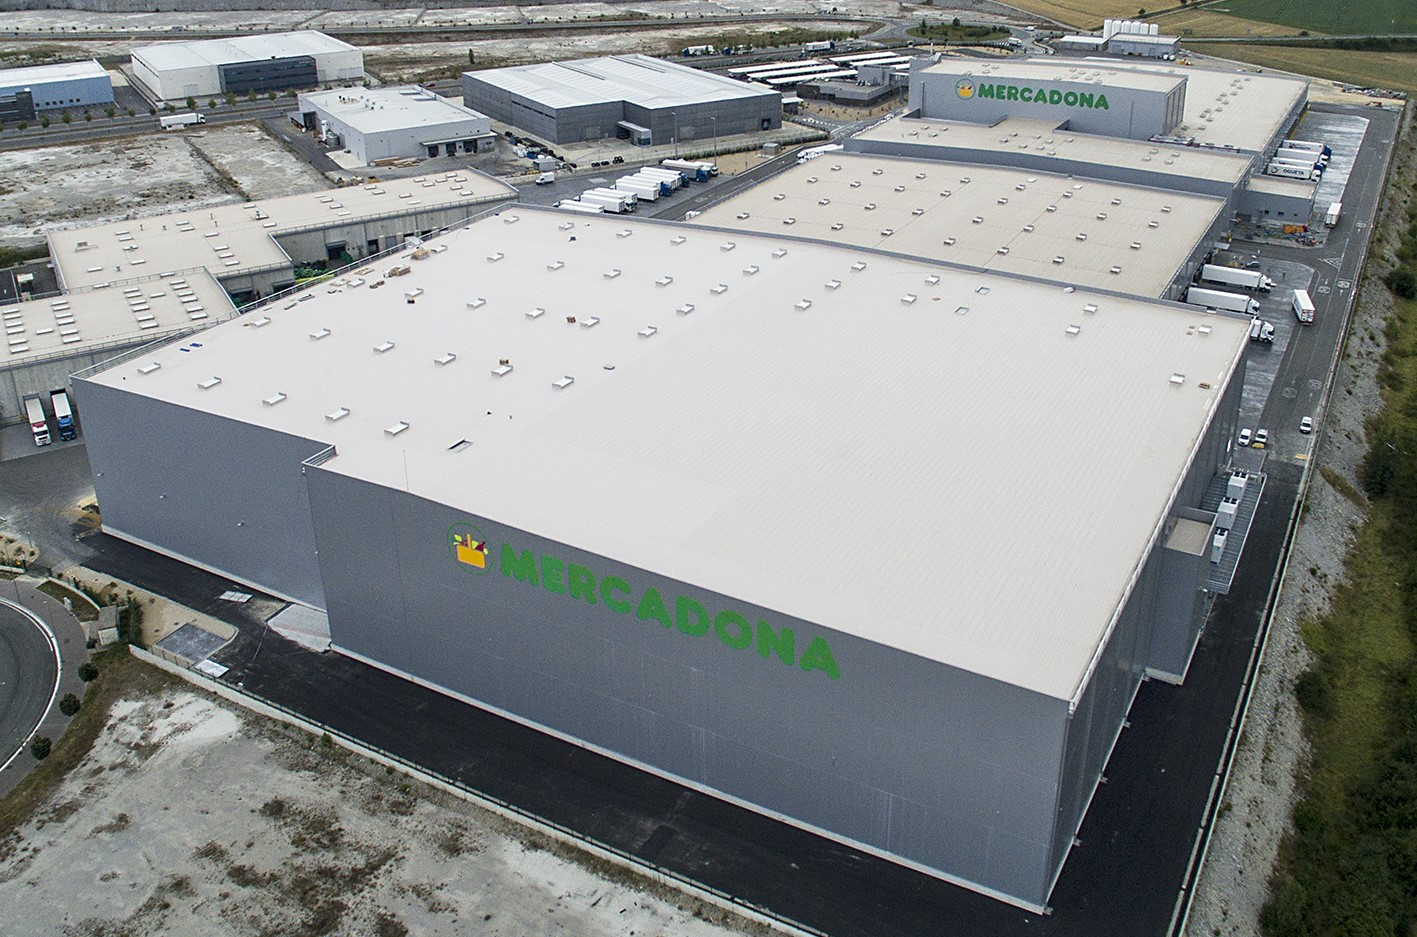 WITRON realisiert auch Mercadona-Trockensortimentslager in Vitoria-Gasteiz